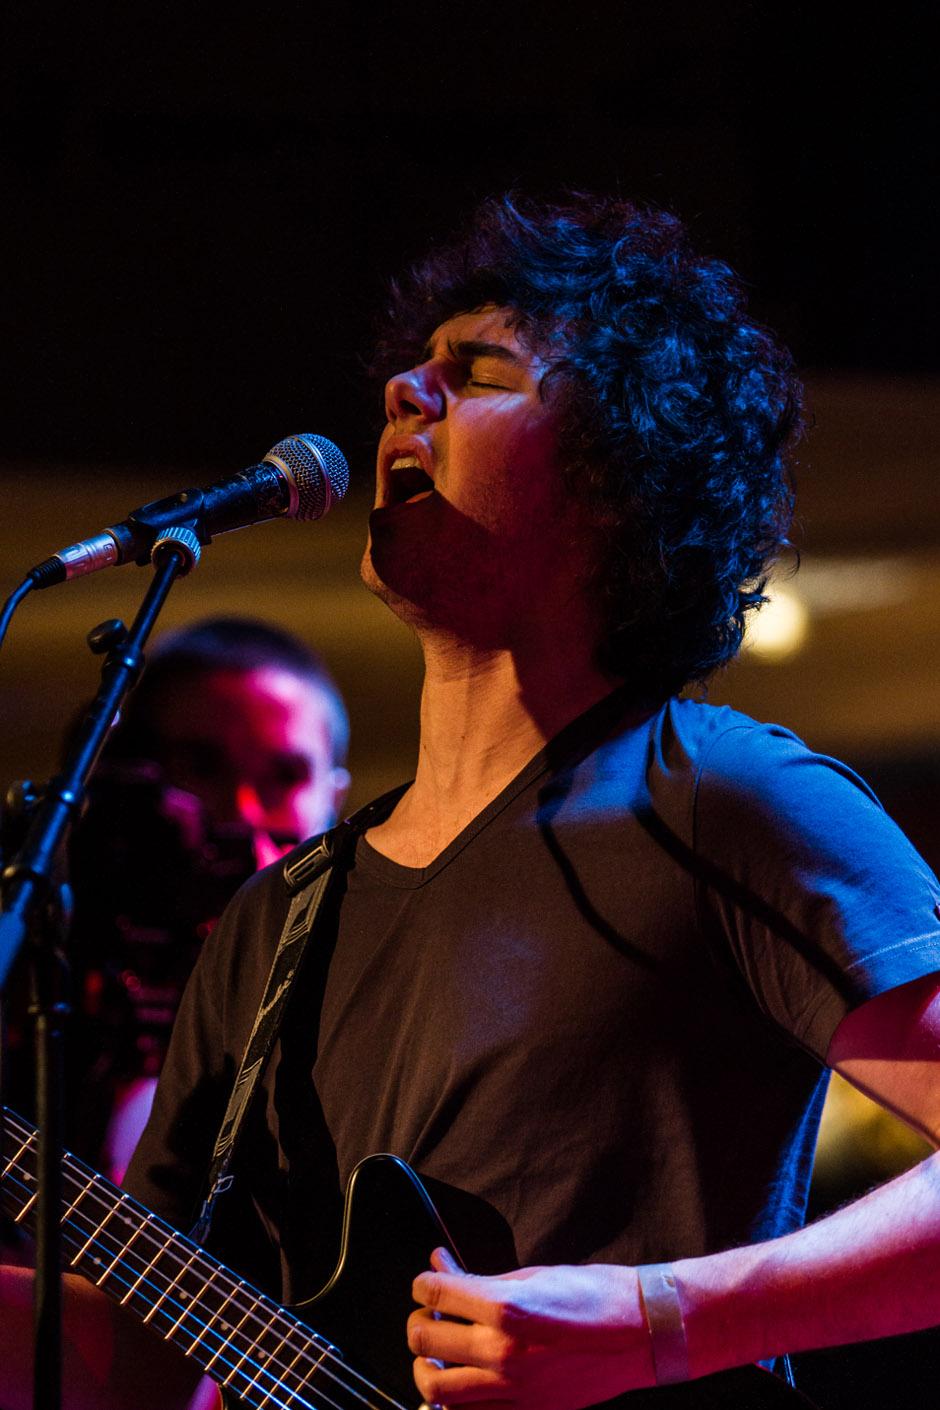 Goldmouth live, 16.02.2013, Hamurg